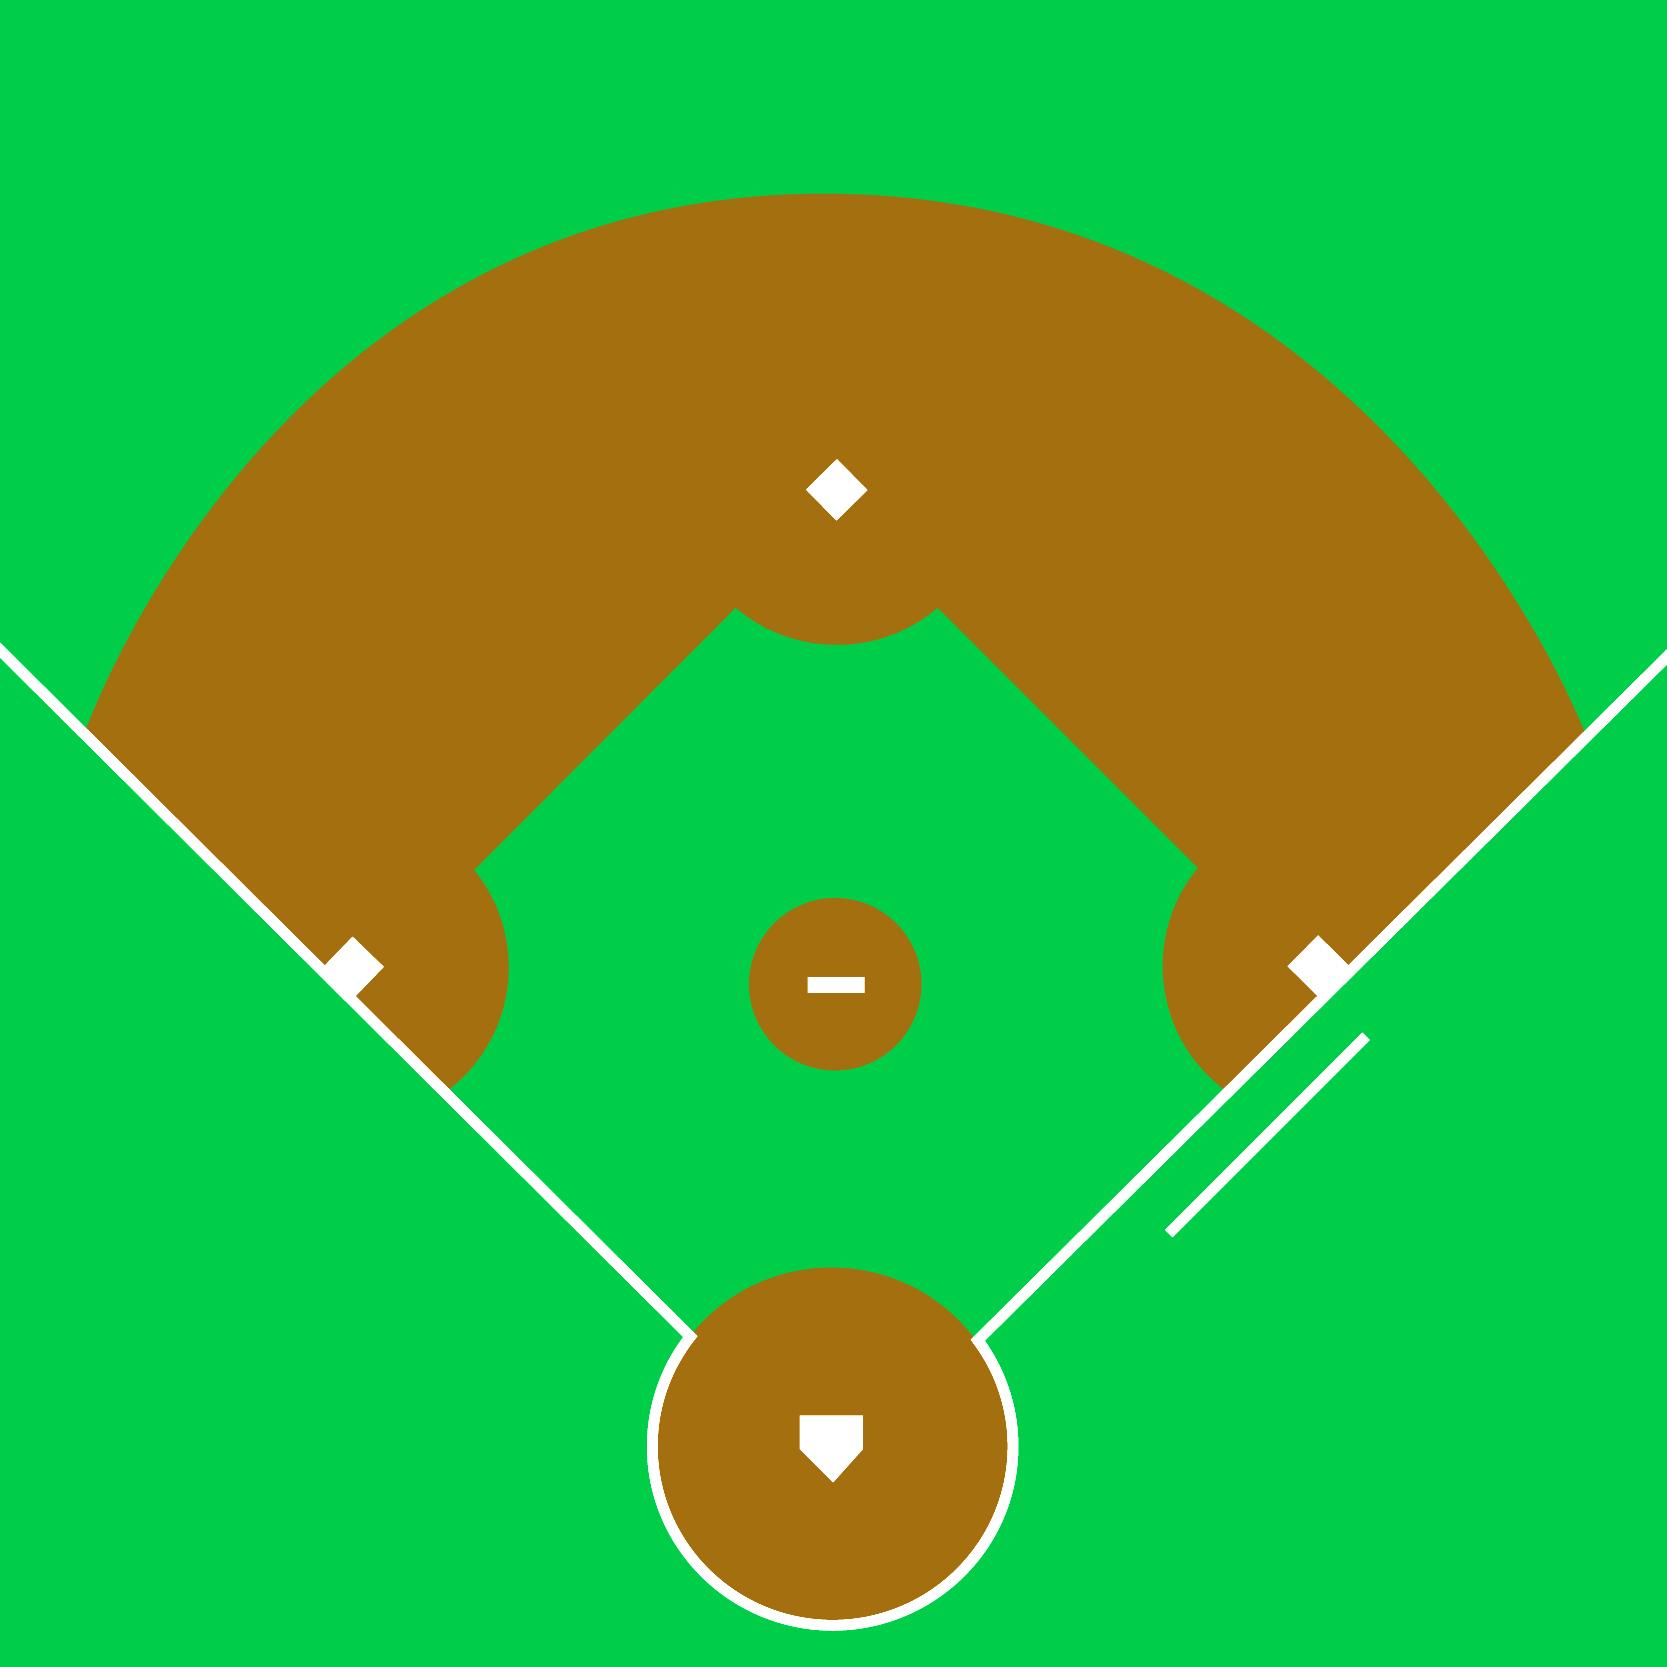 Free kickball cliparts download. Softball clipart softball field